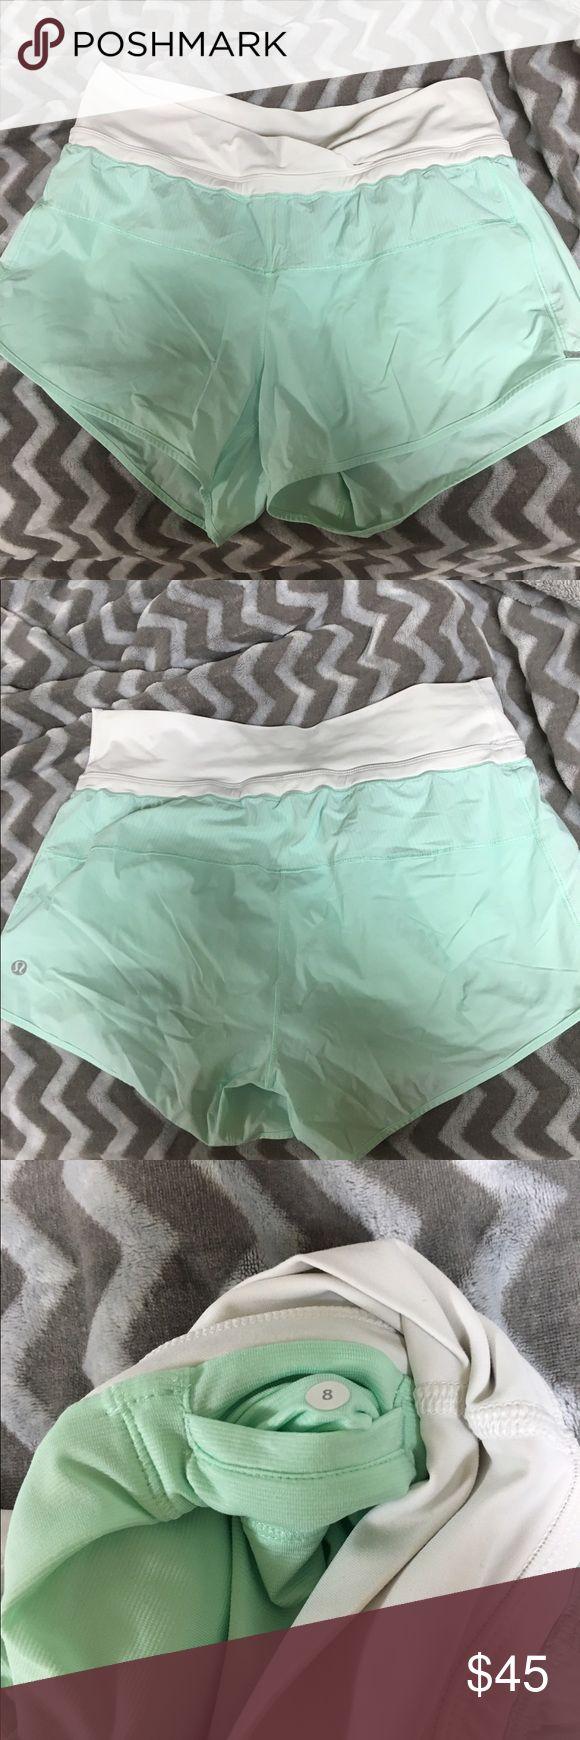 EUC Lululemon mint green shorts Sz 8 Great condition Lululemon mint green shorts in a size 8! lululemon athletica Shorts